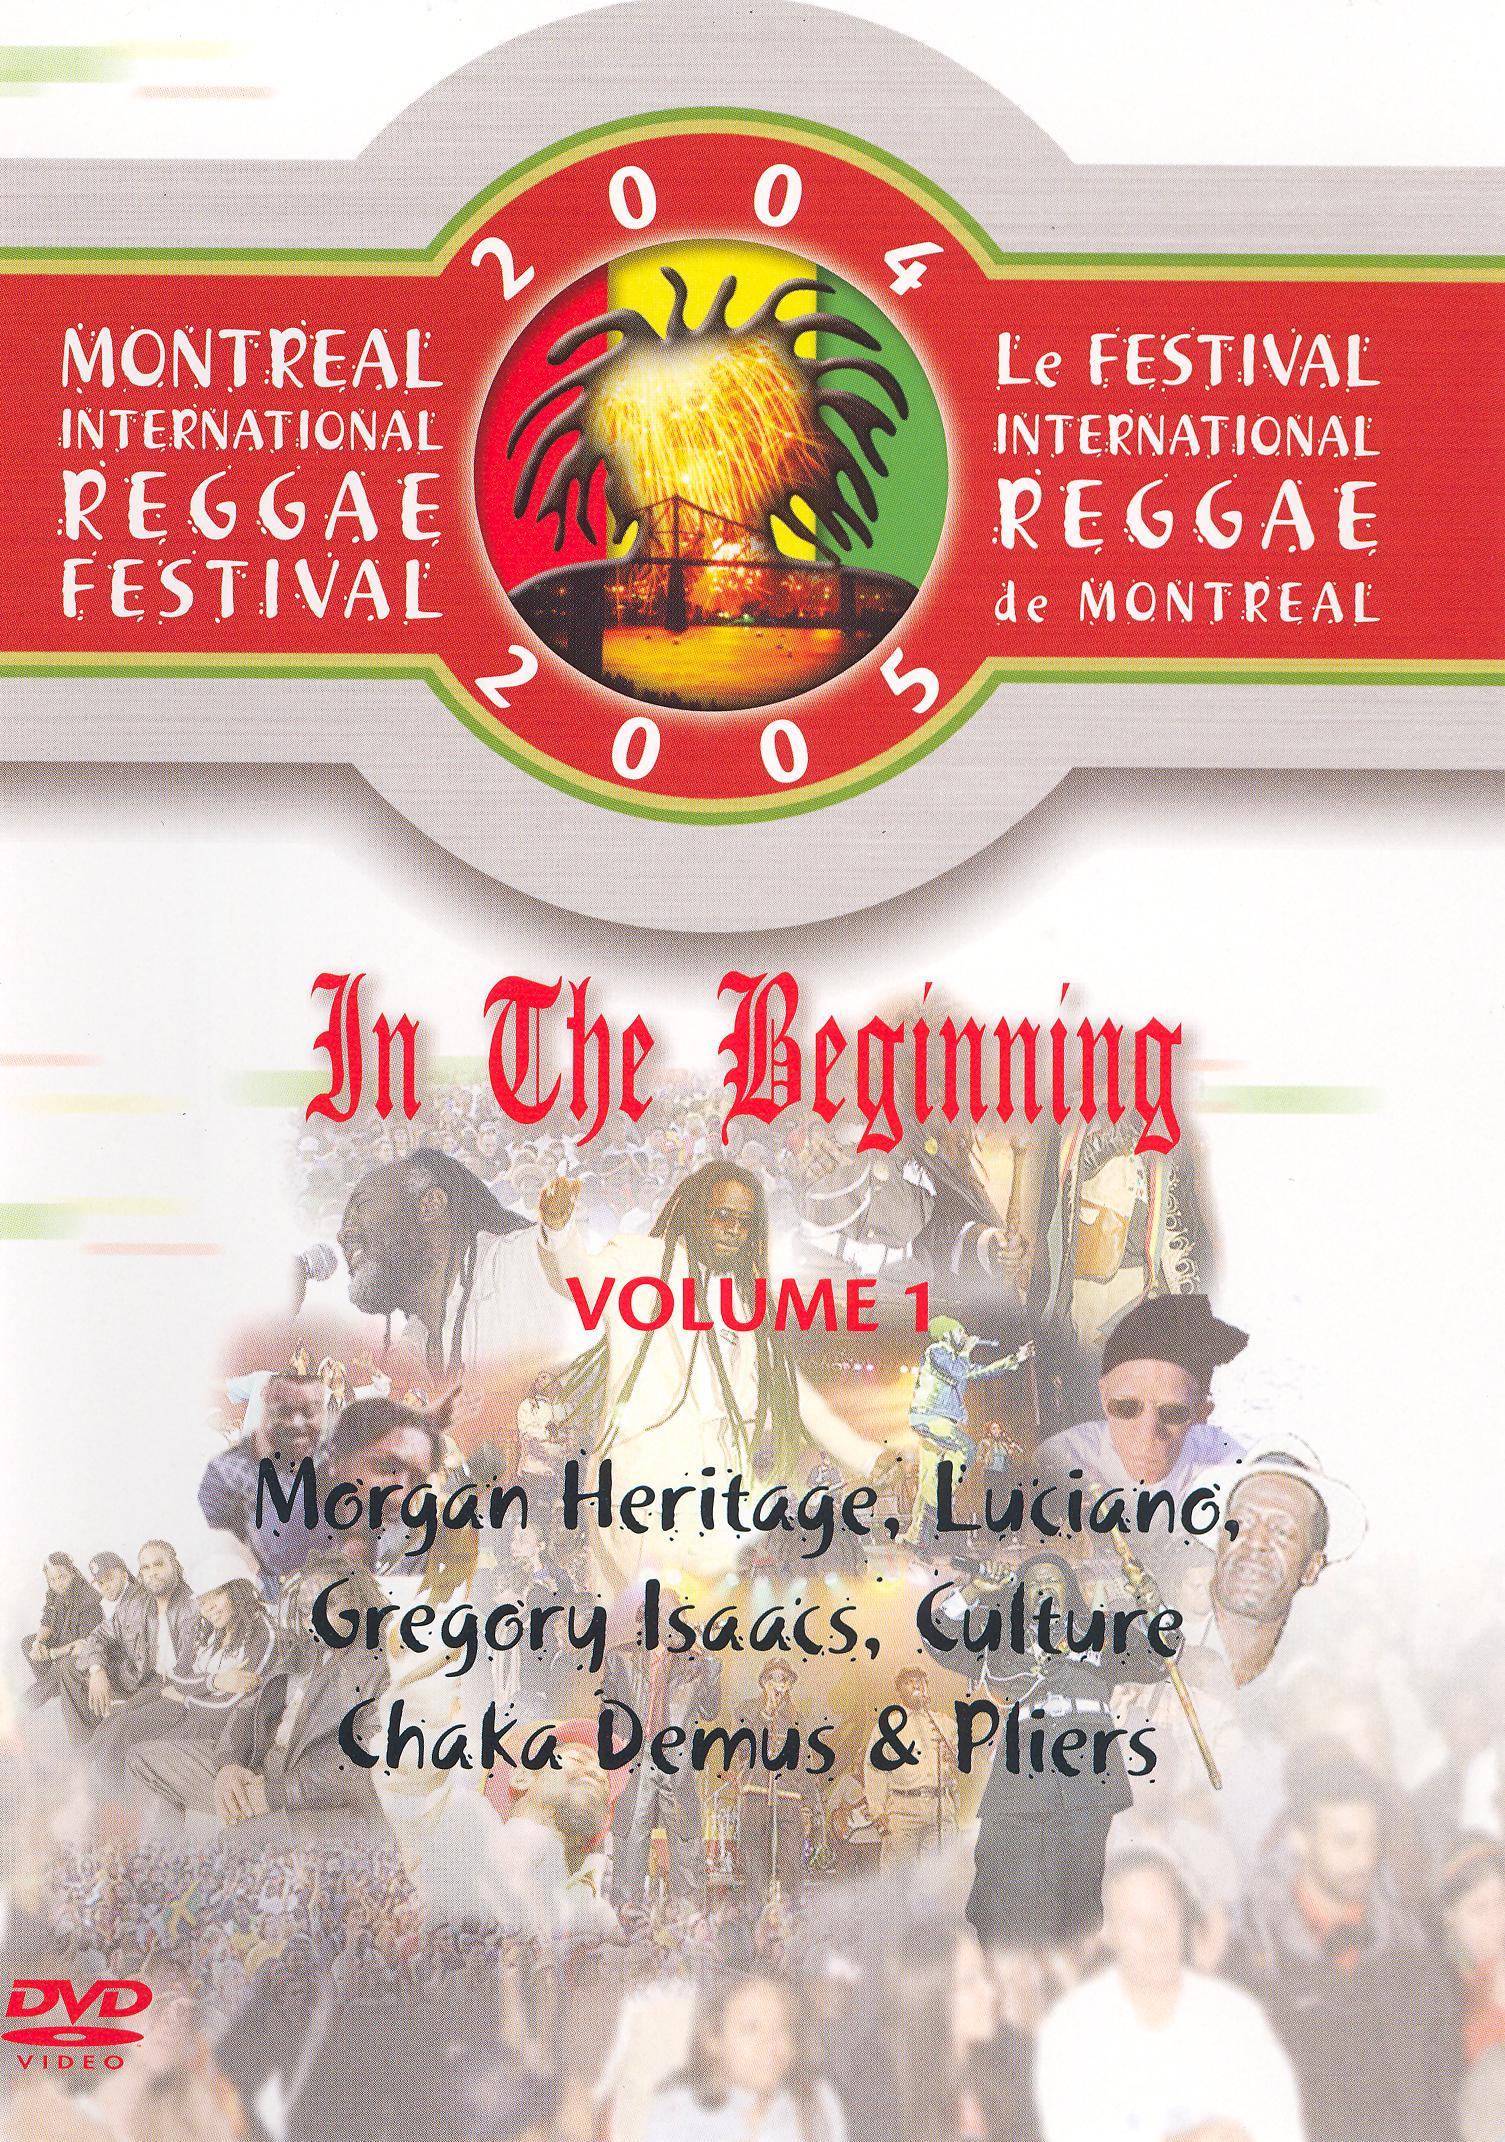 In the Beginning, Vol. 1: 2006 Montreal International Reggae Festival